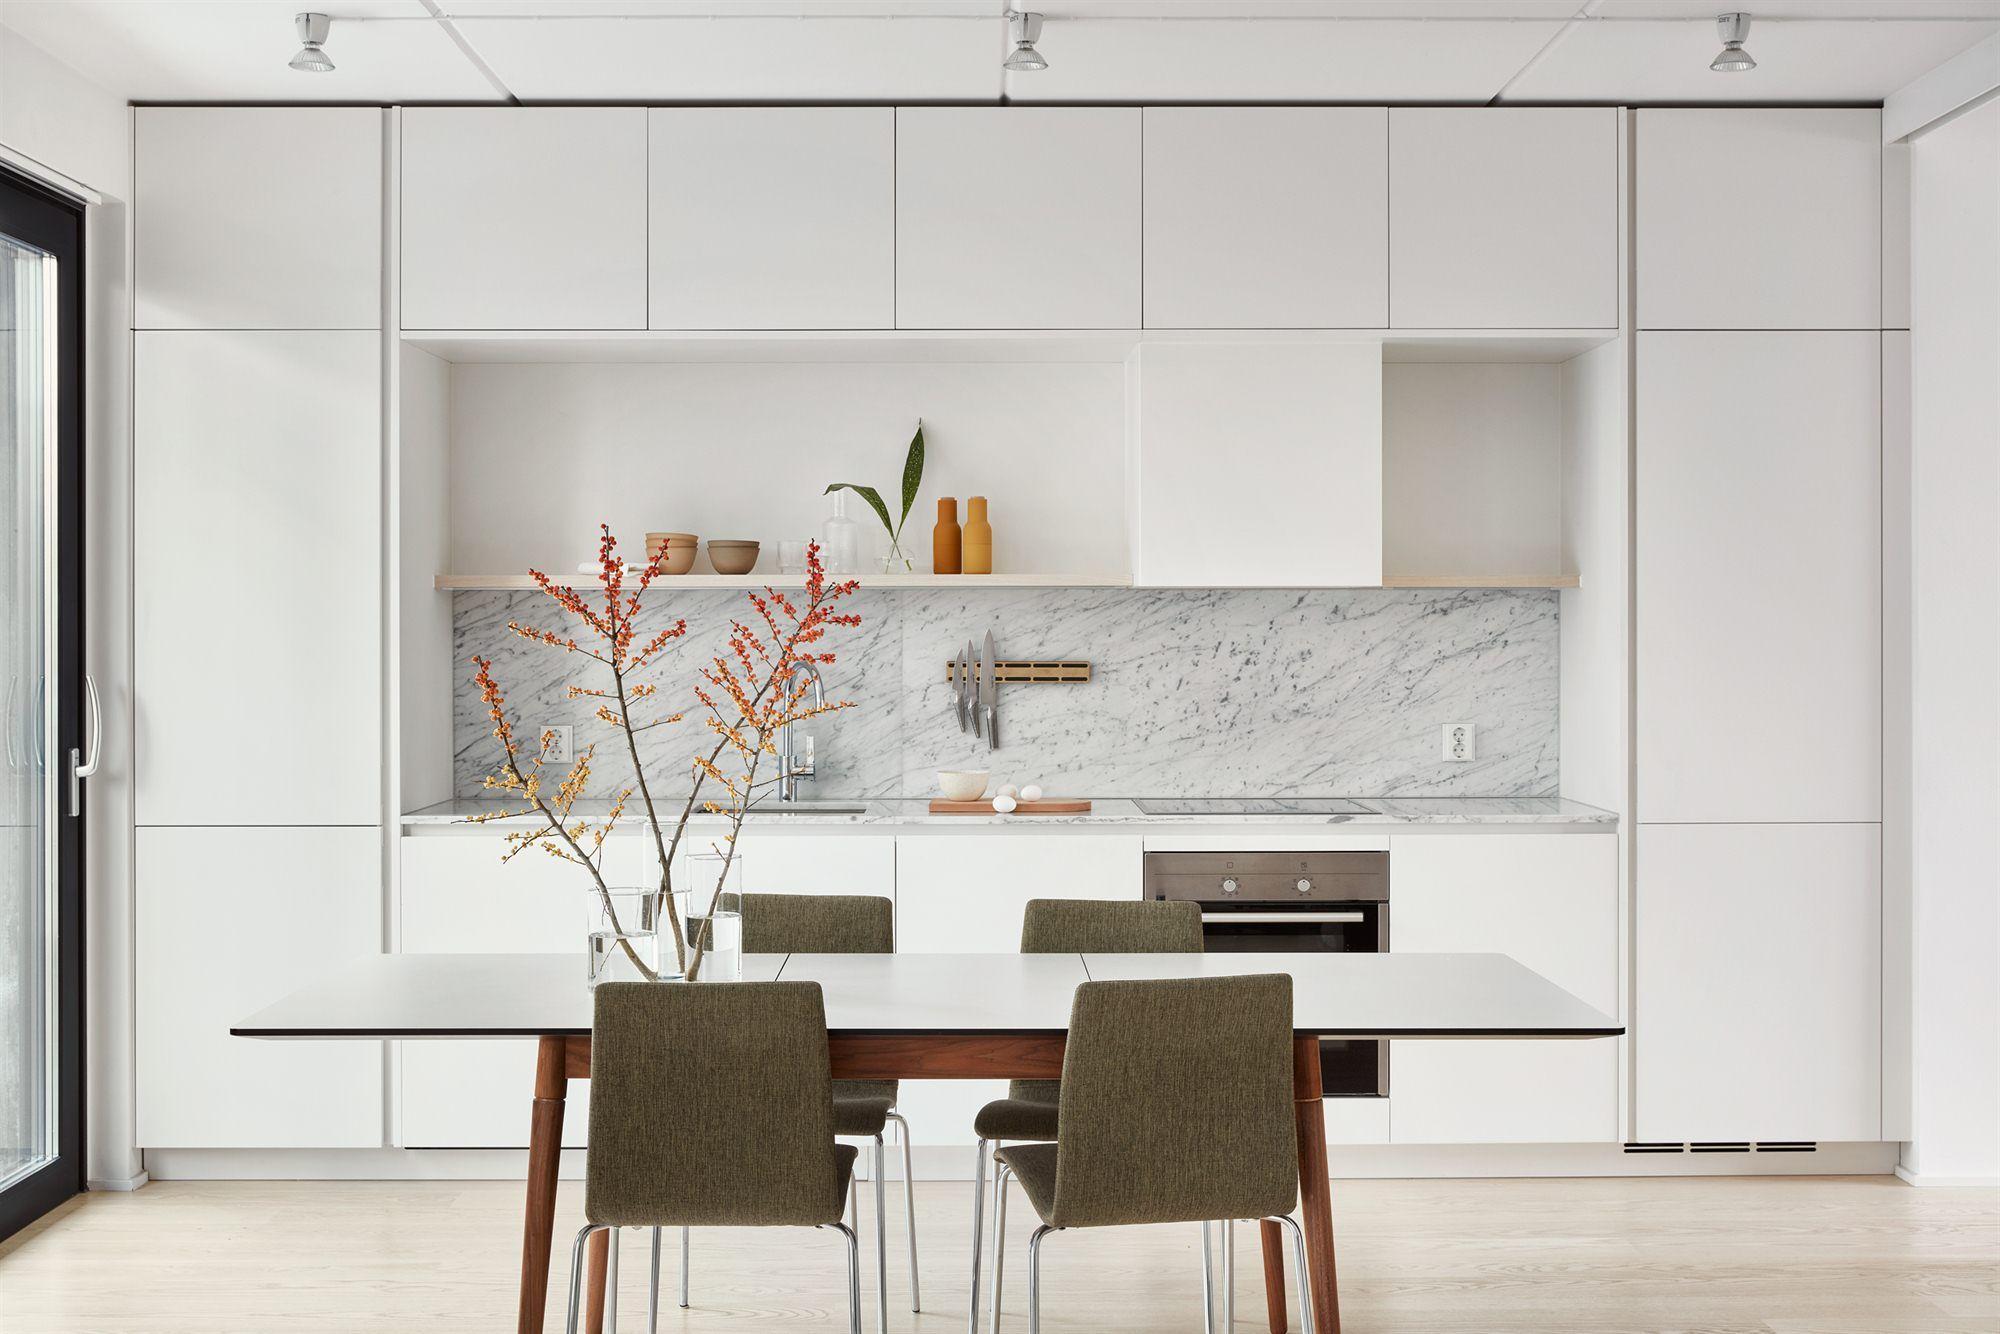 Kitchen Marble Perfect Interior Scandinavian Deco Sj Fartsgatan 6 -